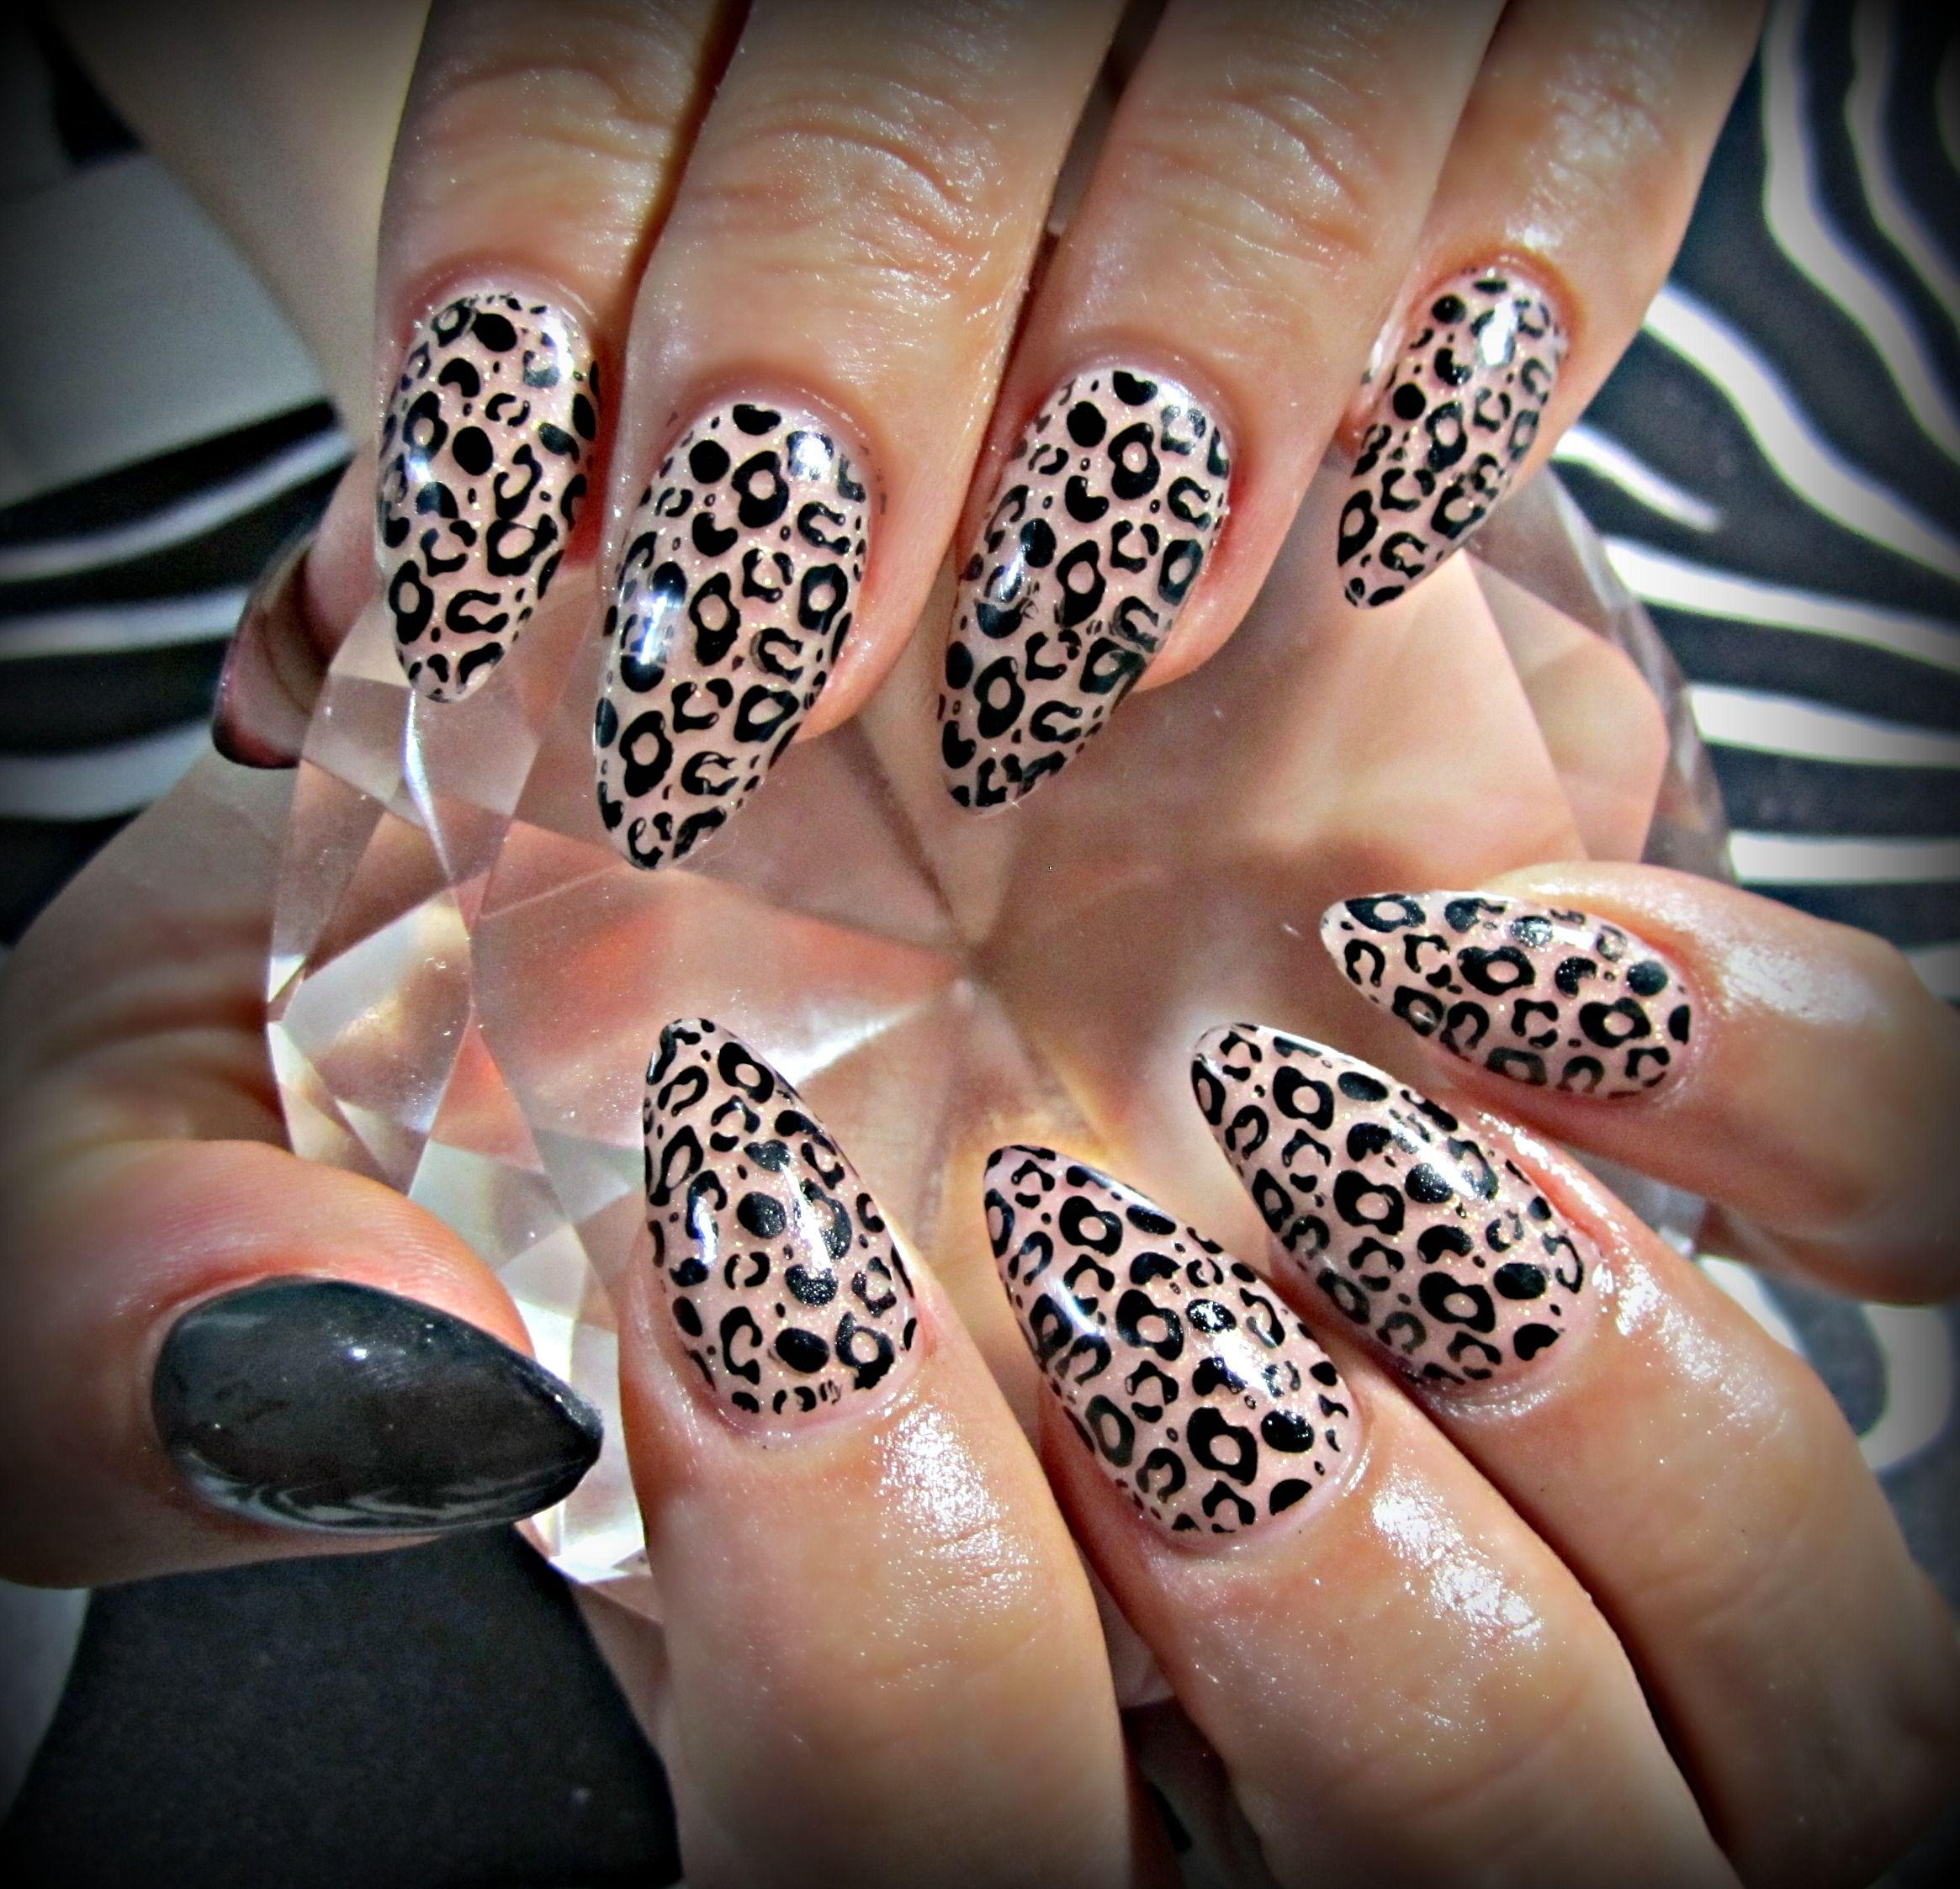 Animal Print Nail Ideas Lilostyle In 2020 Fall Acrylic Nails Leopard Print Nails Nail Designs